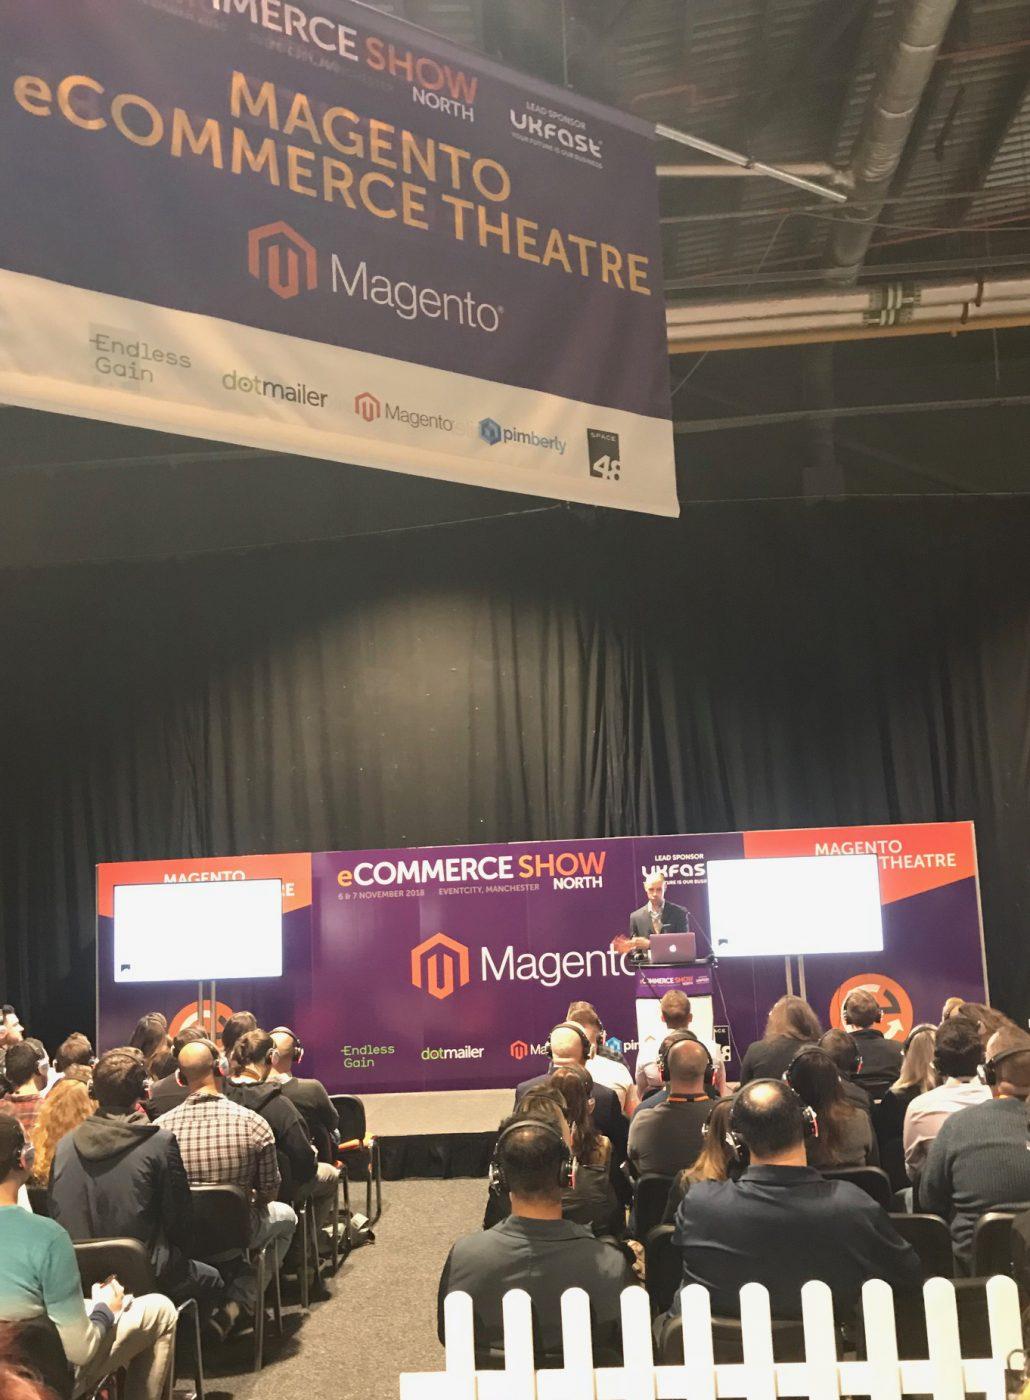 Magento eCommerce Theatre | eCommerce Show North